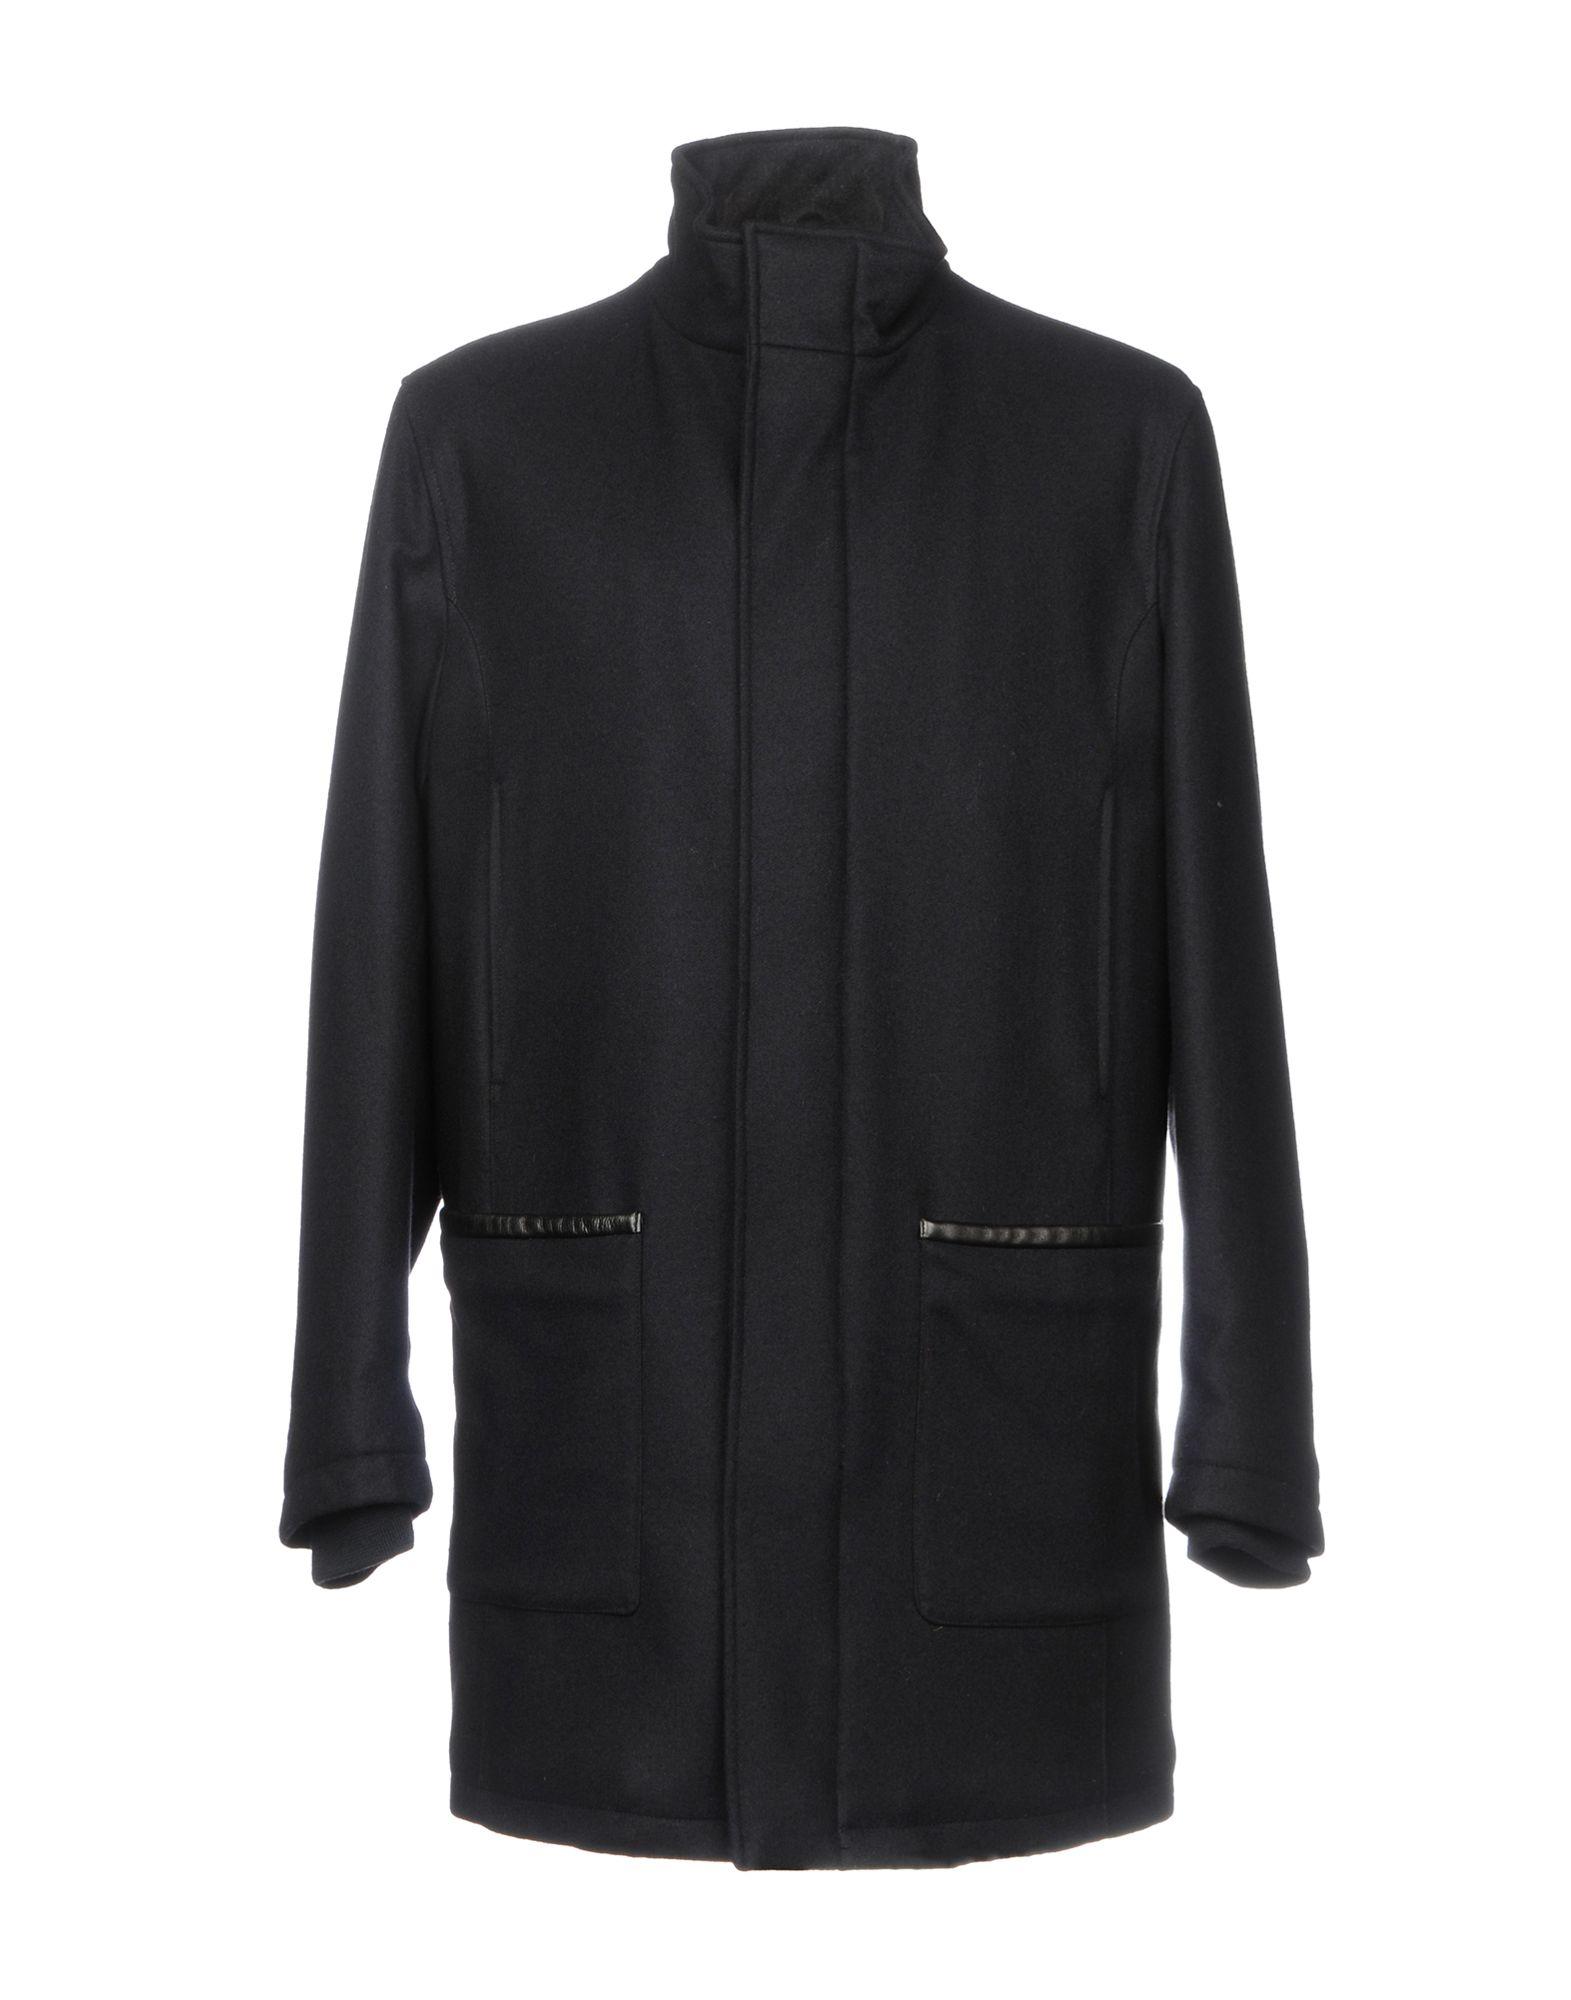 Giubbotto Givenchy Donna - Acquista online su